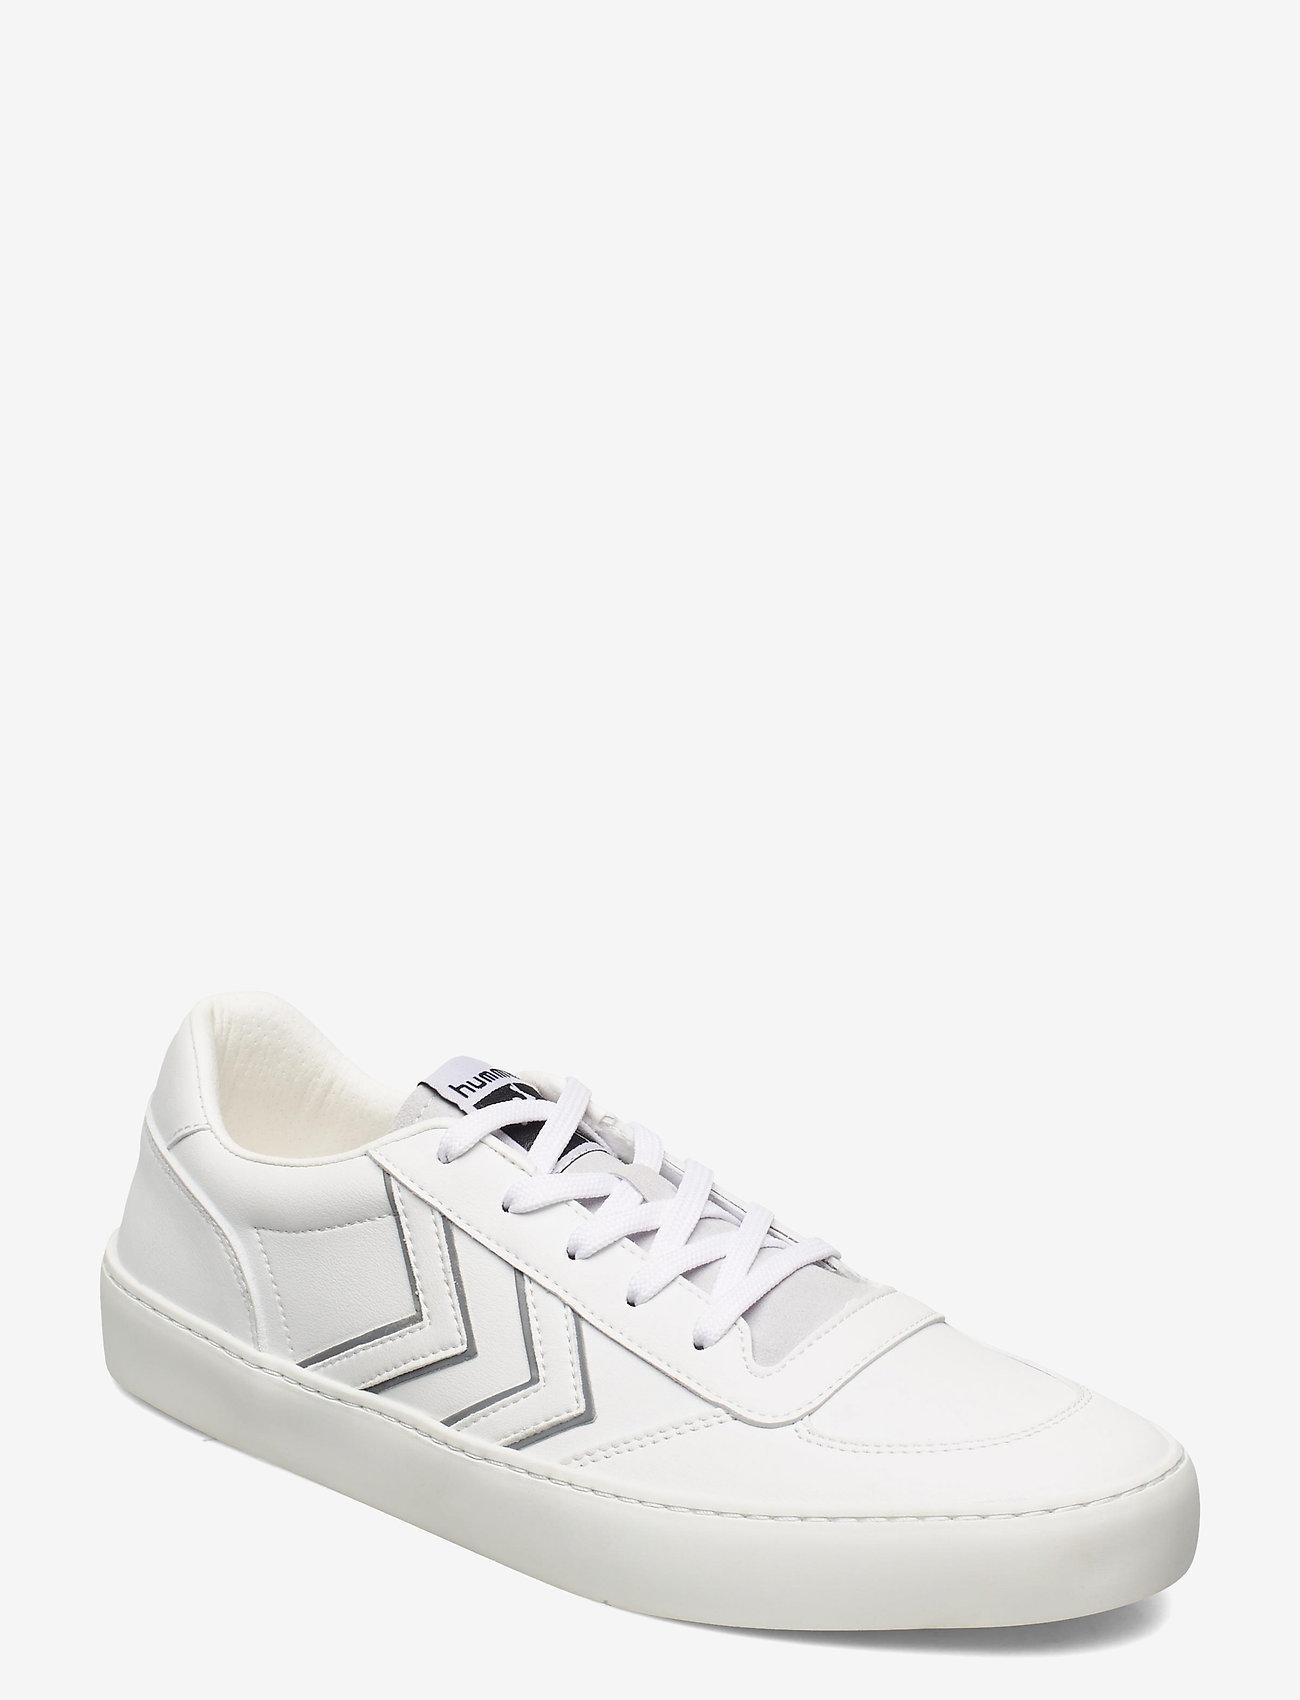 Hummel - STADIL 3.0 PREMIUM - laag sneakers - white - 1